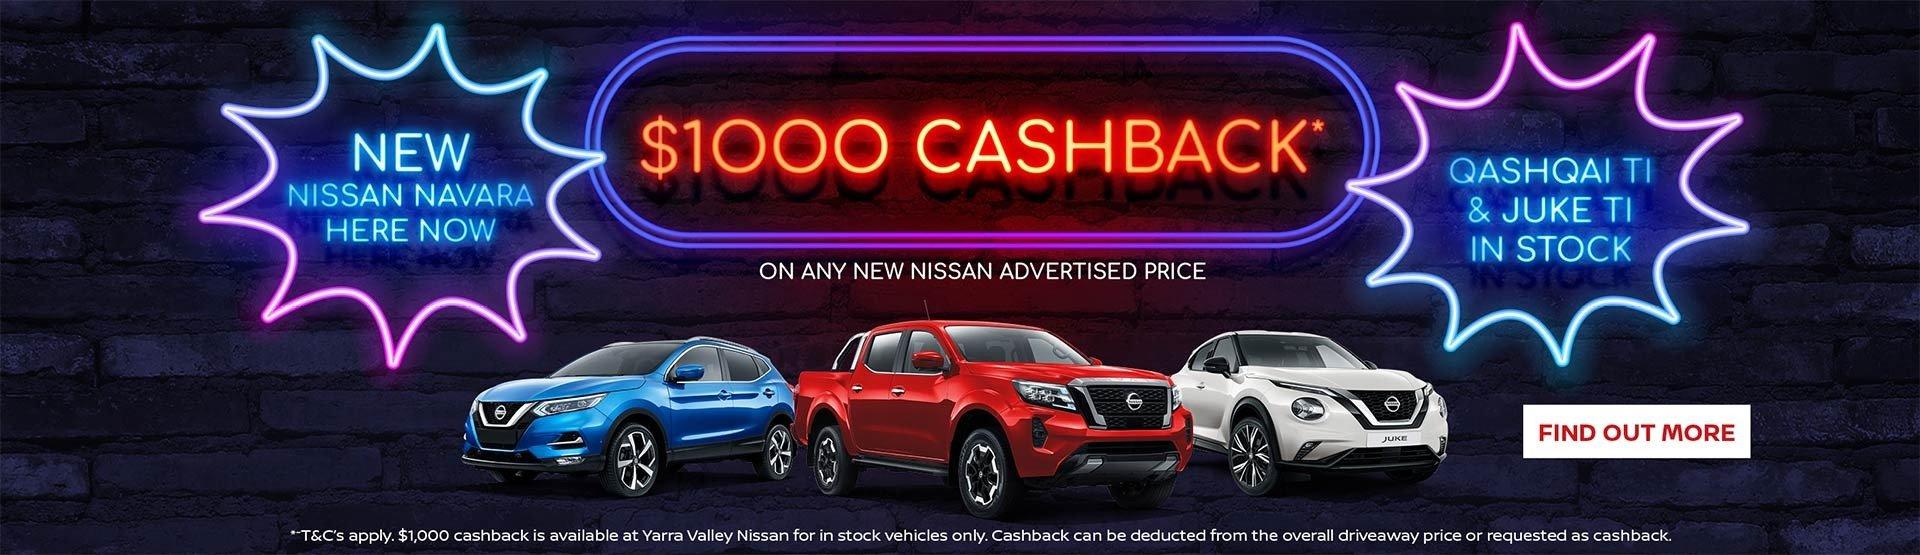 Yarra Valley Nissan - $1000 CashBack